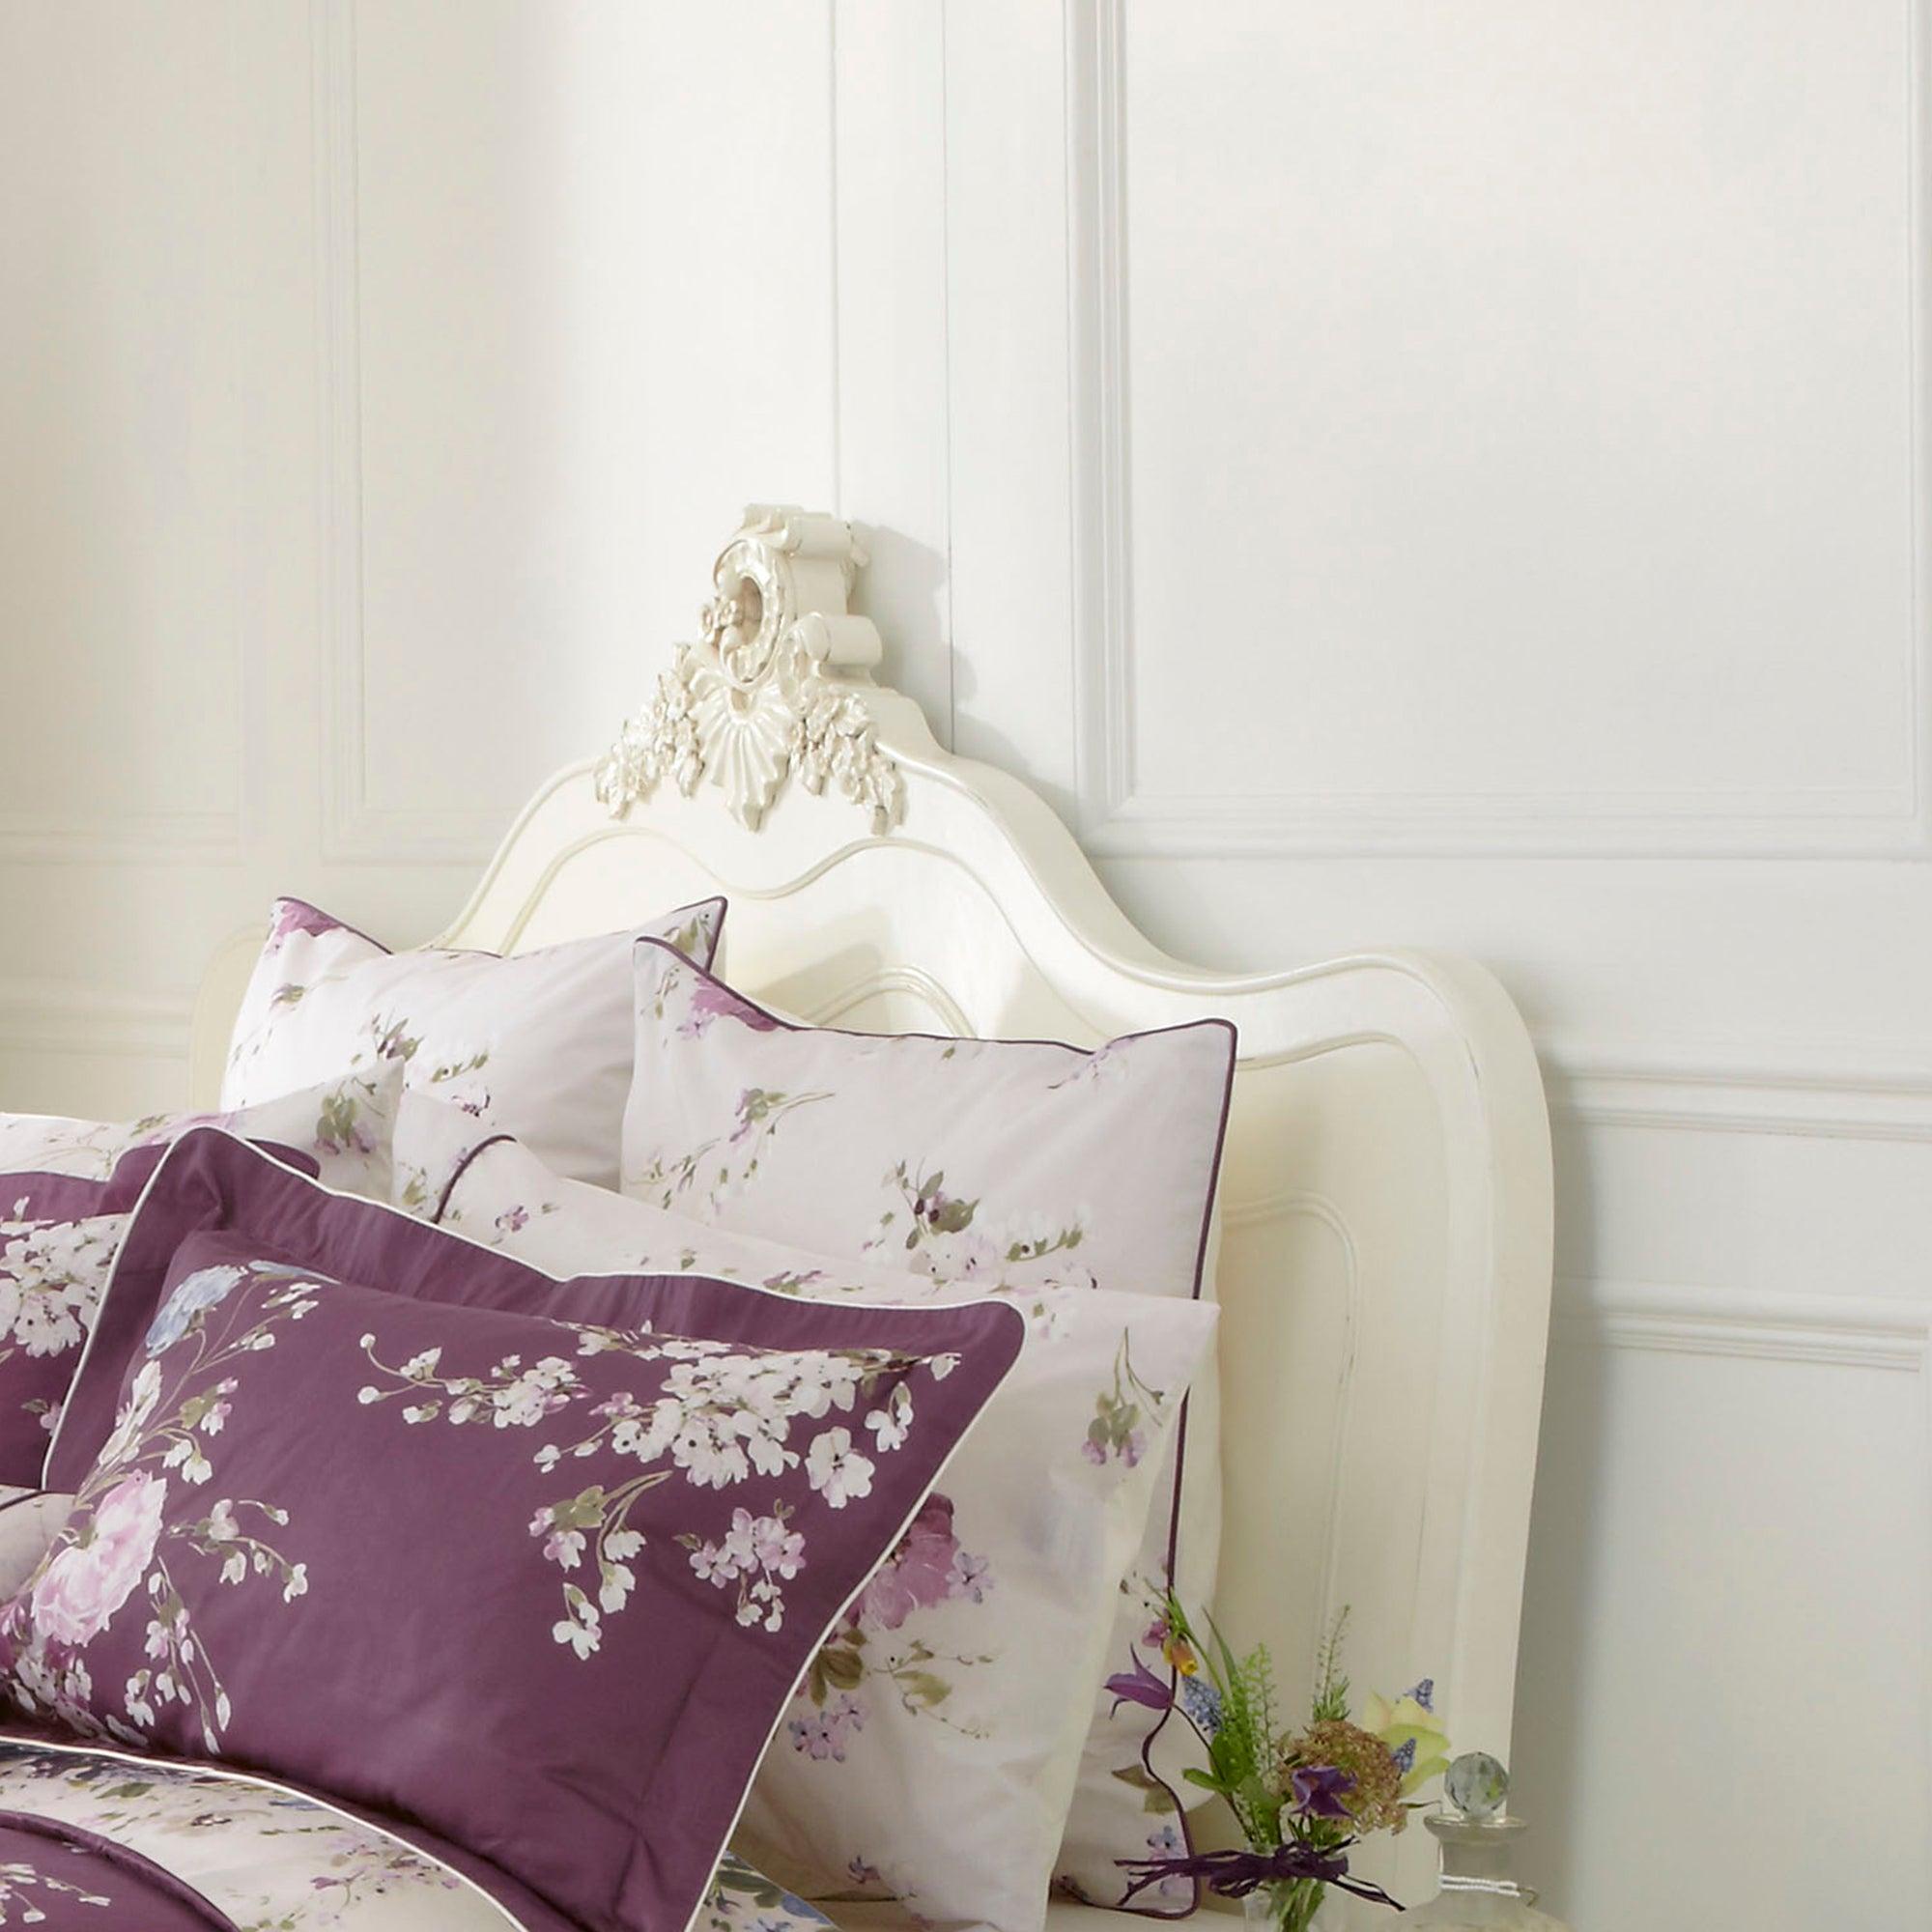 Buy Cheap Dorma Bedding Compare Home Textiles Prices For